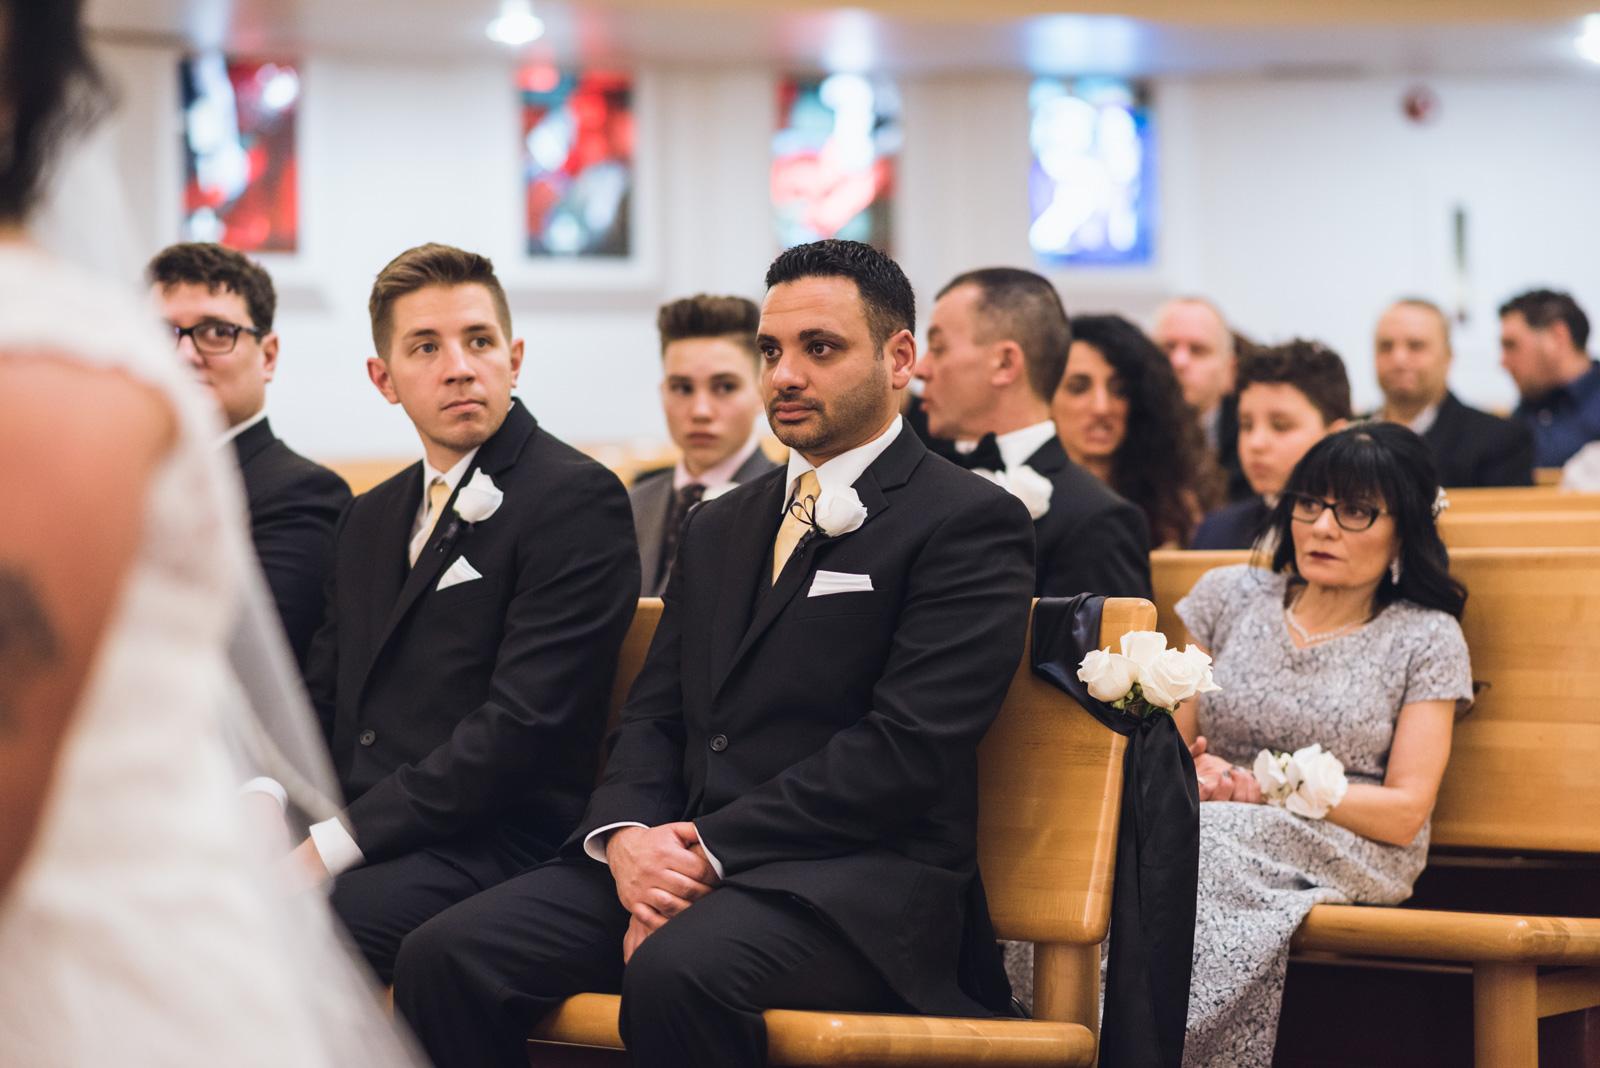 rheana-chris-wedding-blog-136.jpg